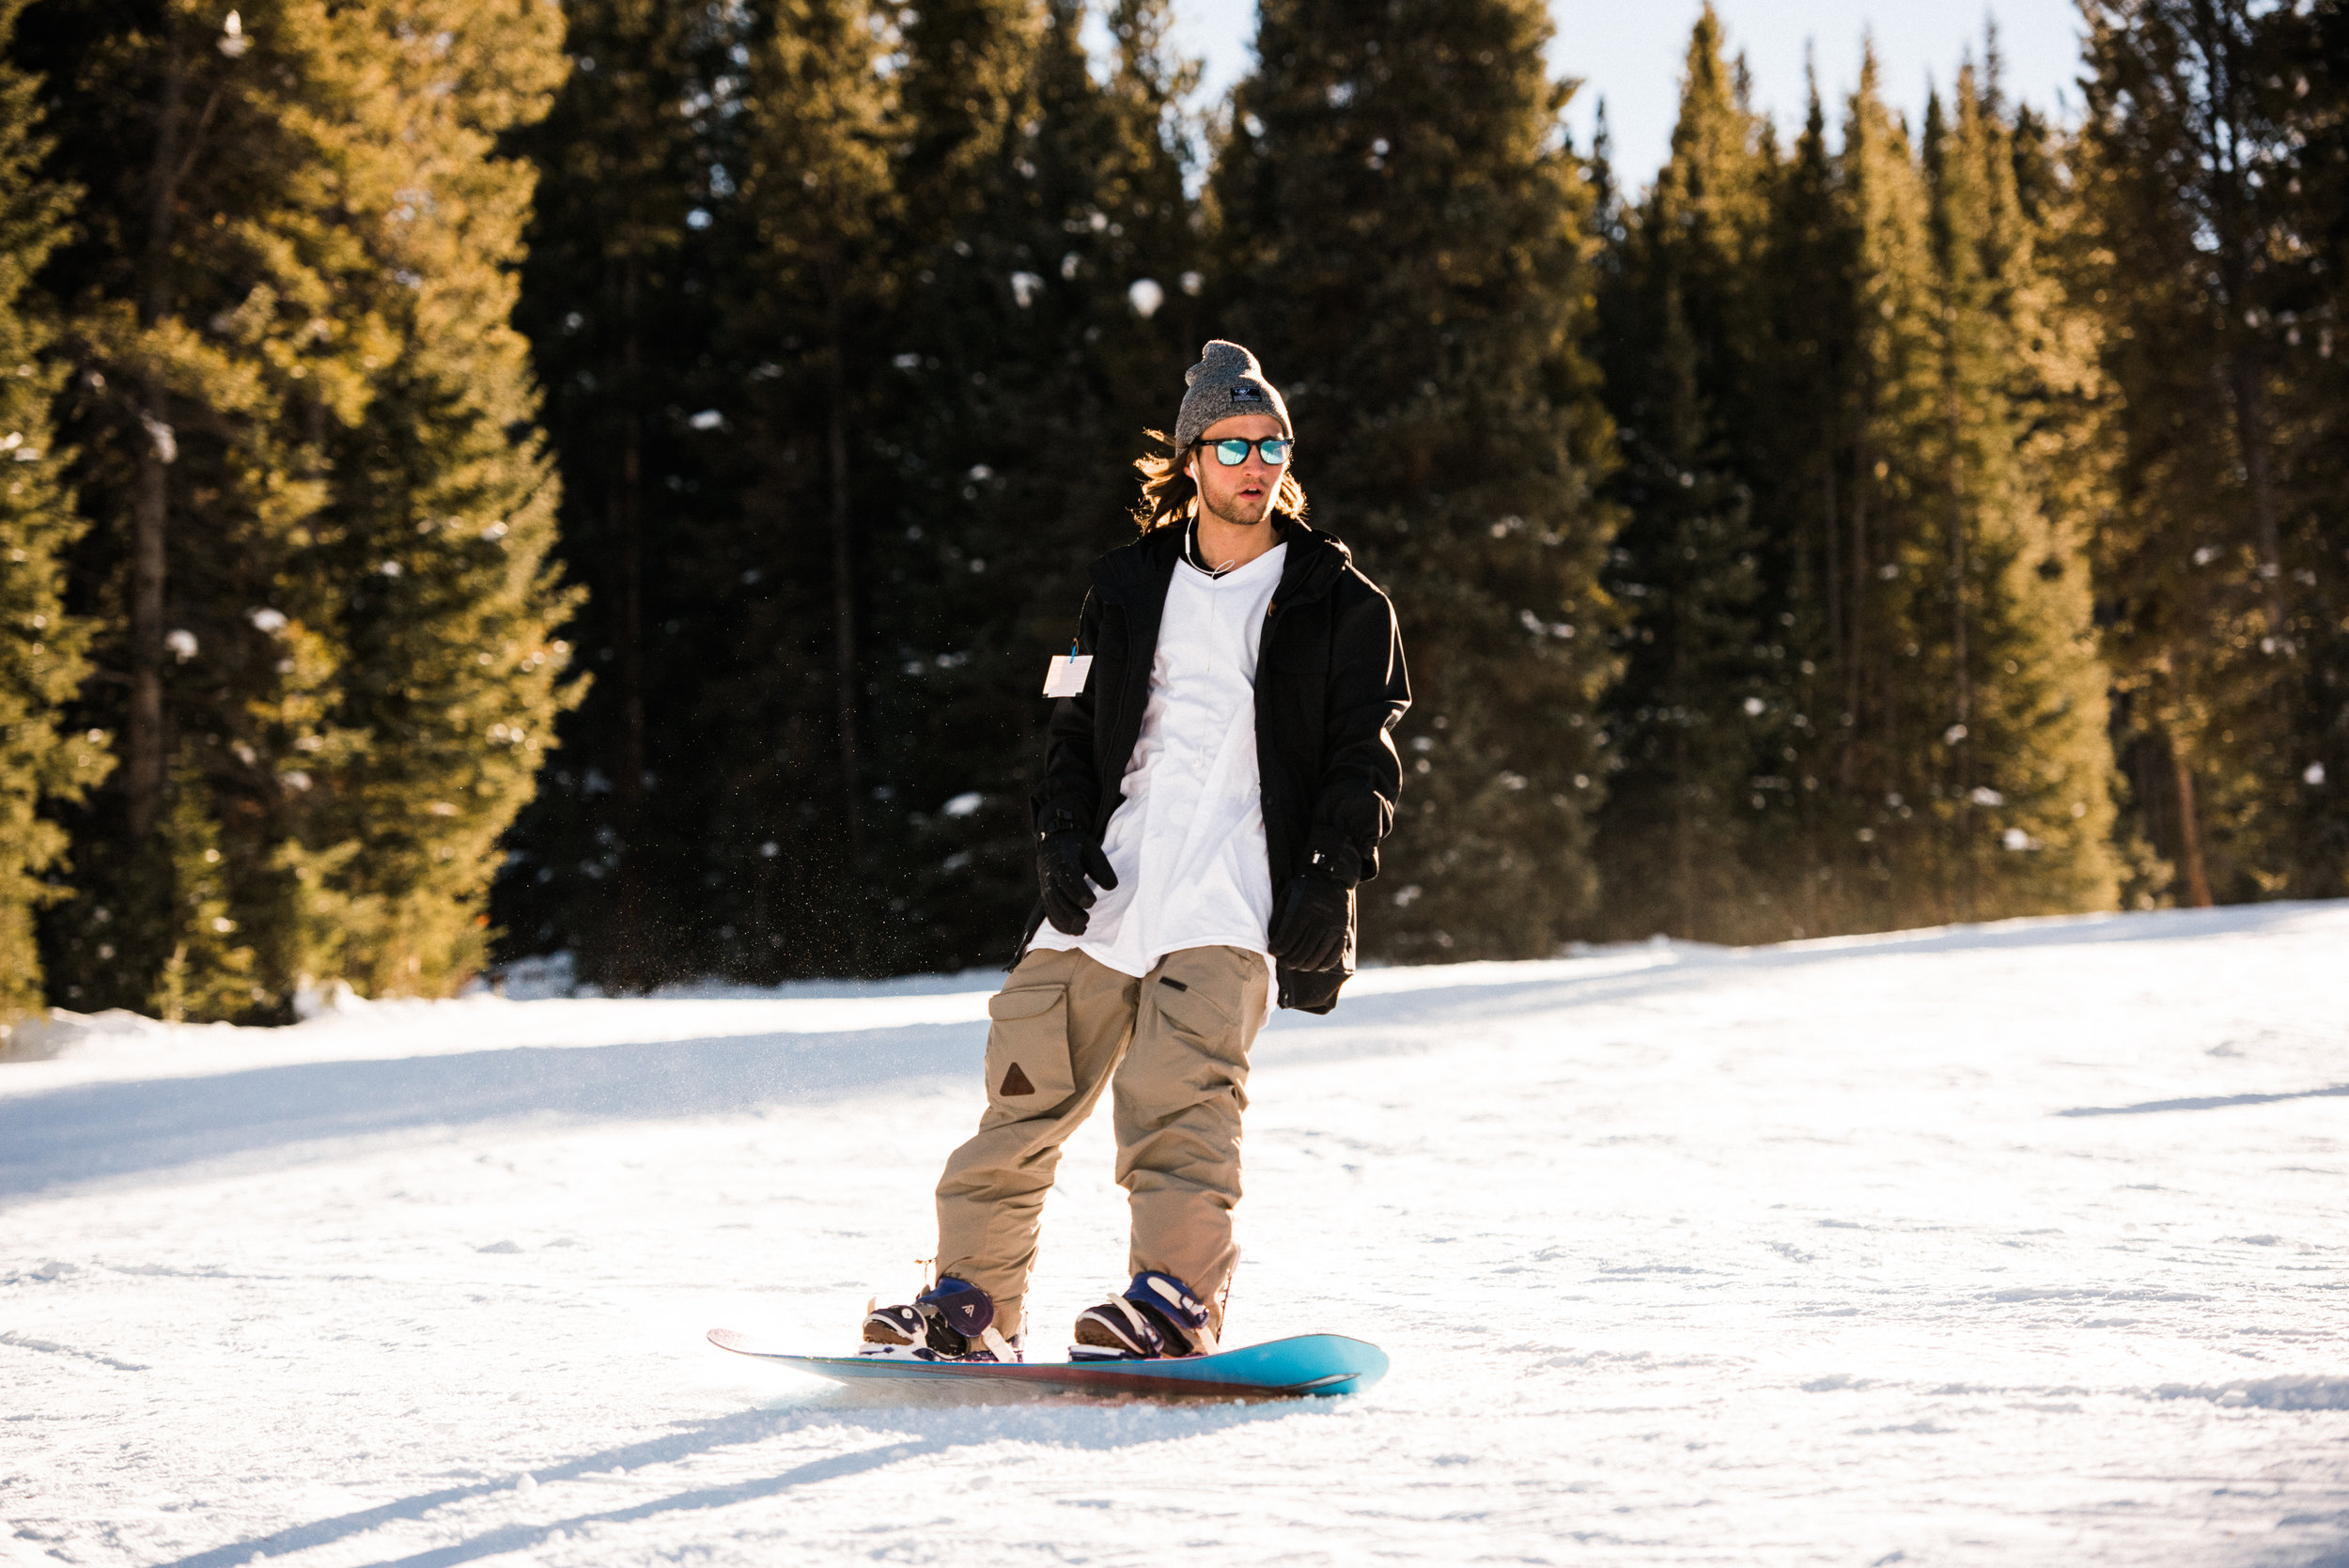 TaraShupe_Outdoor_Photographer_Loweprobags_Colorado_Copper_Mountains_Ski_55.jpg